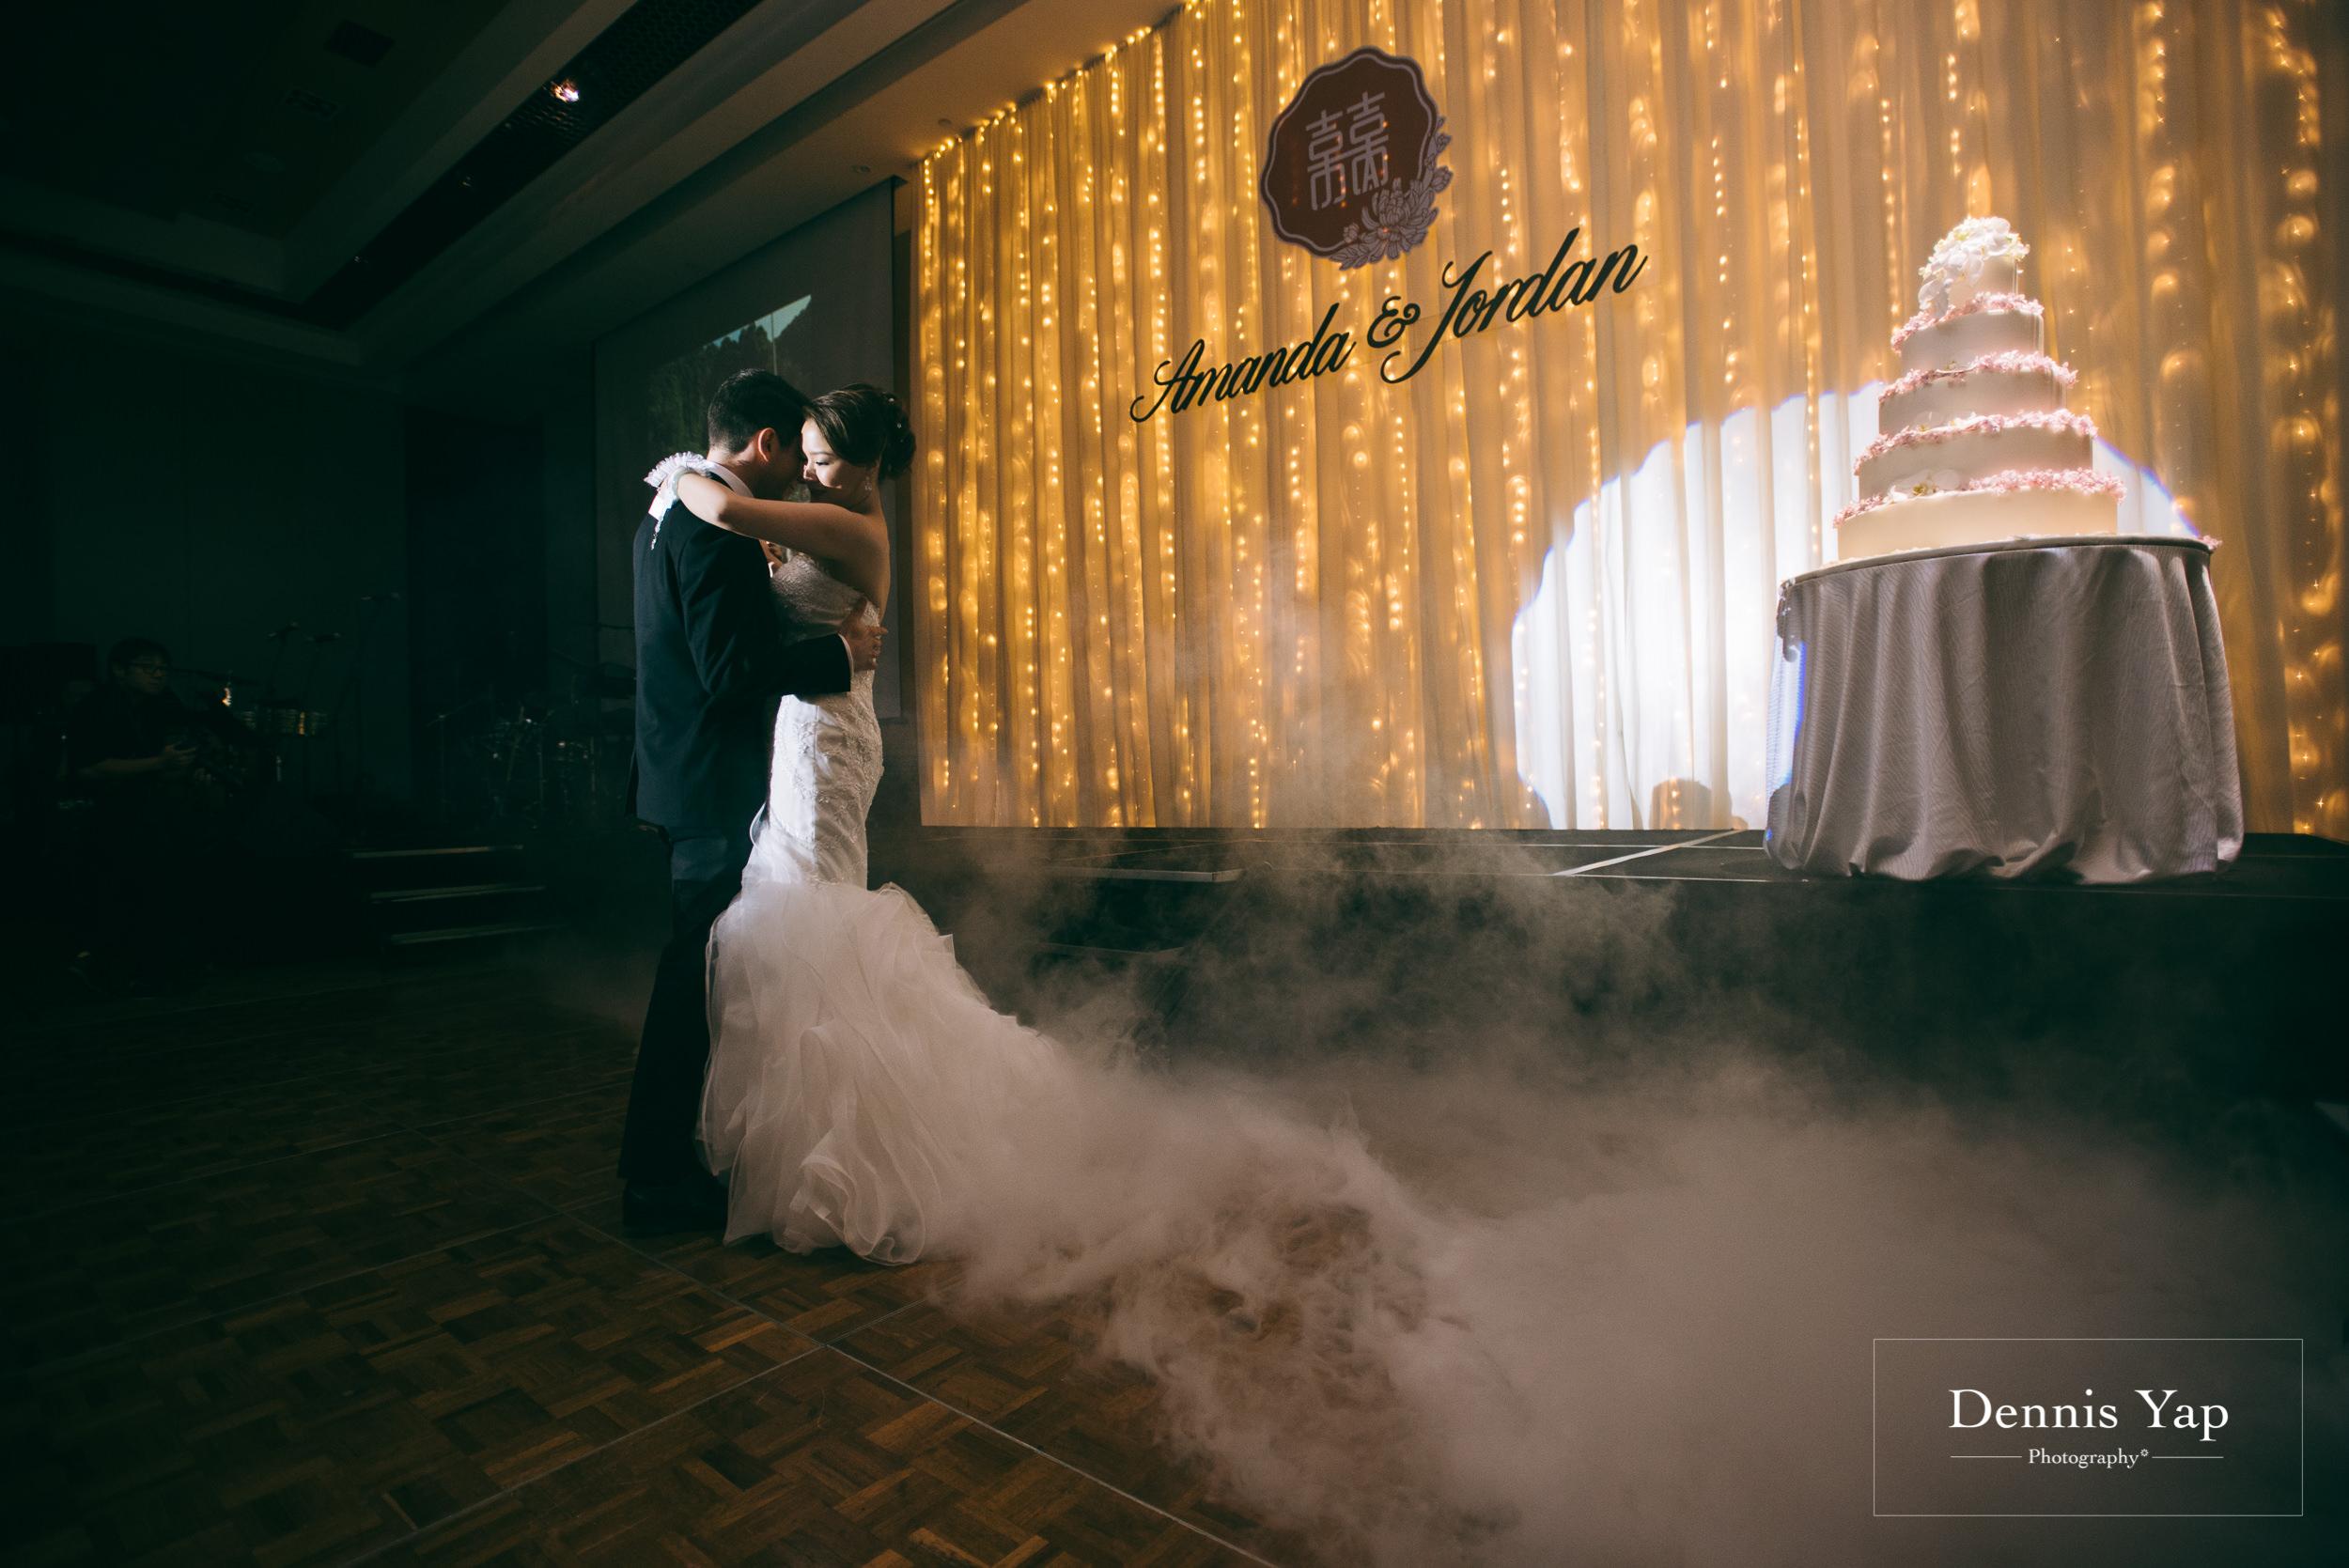 jordan amanda wedding day westin hotel kuala lumpur choe family dennis yap photography-30.jpg